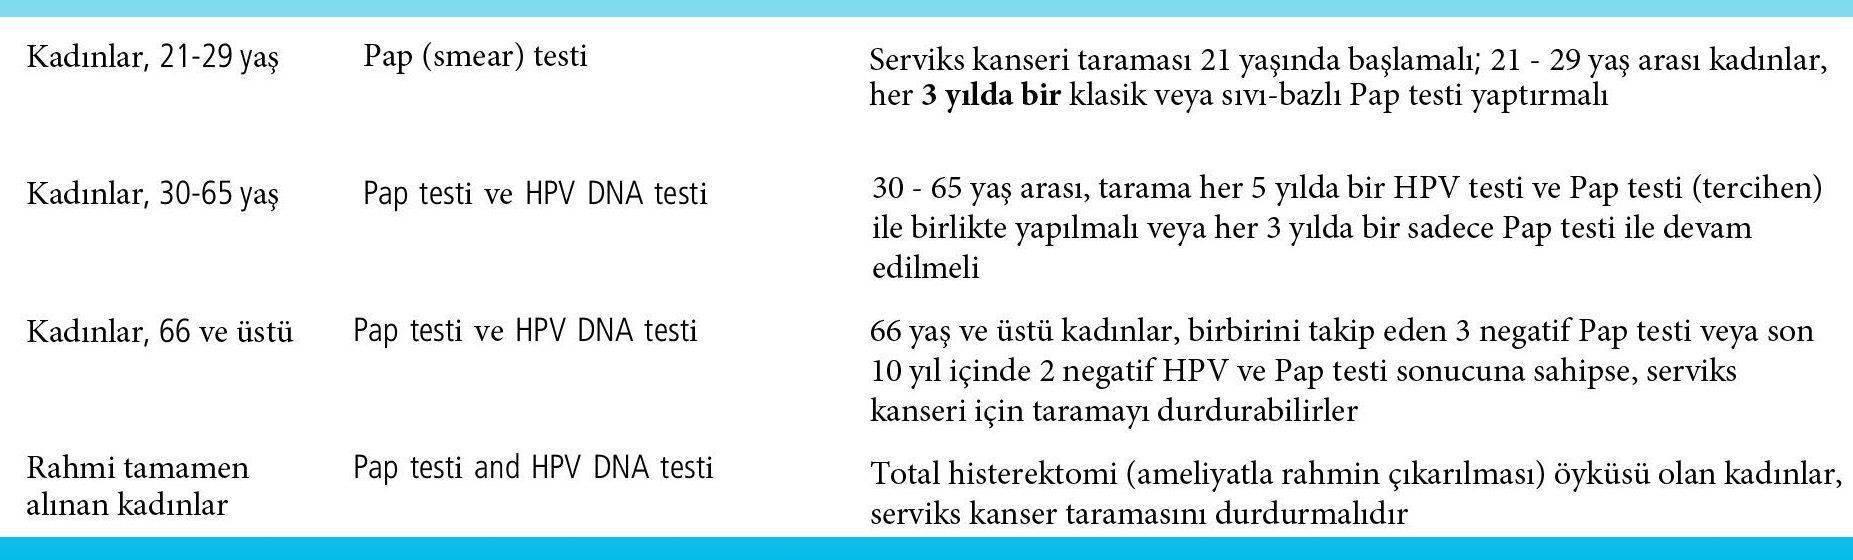 tes hpv dna adalah papilloma vírus torokember